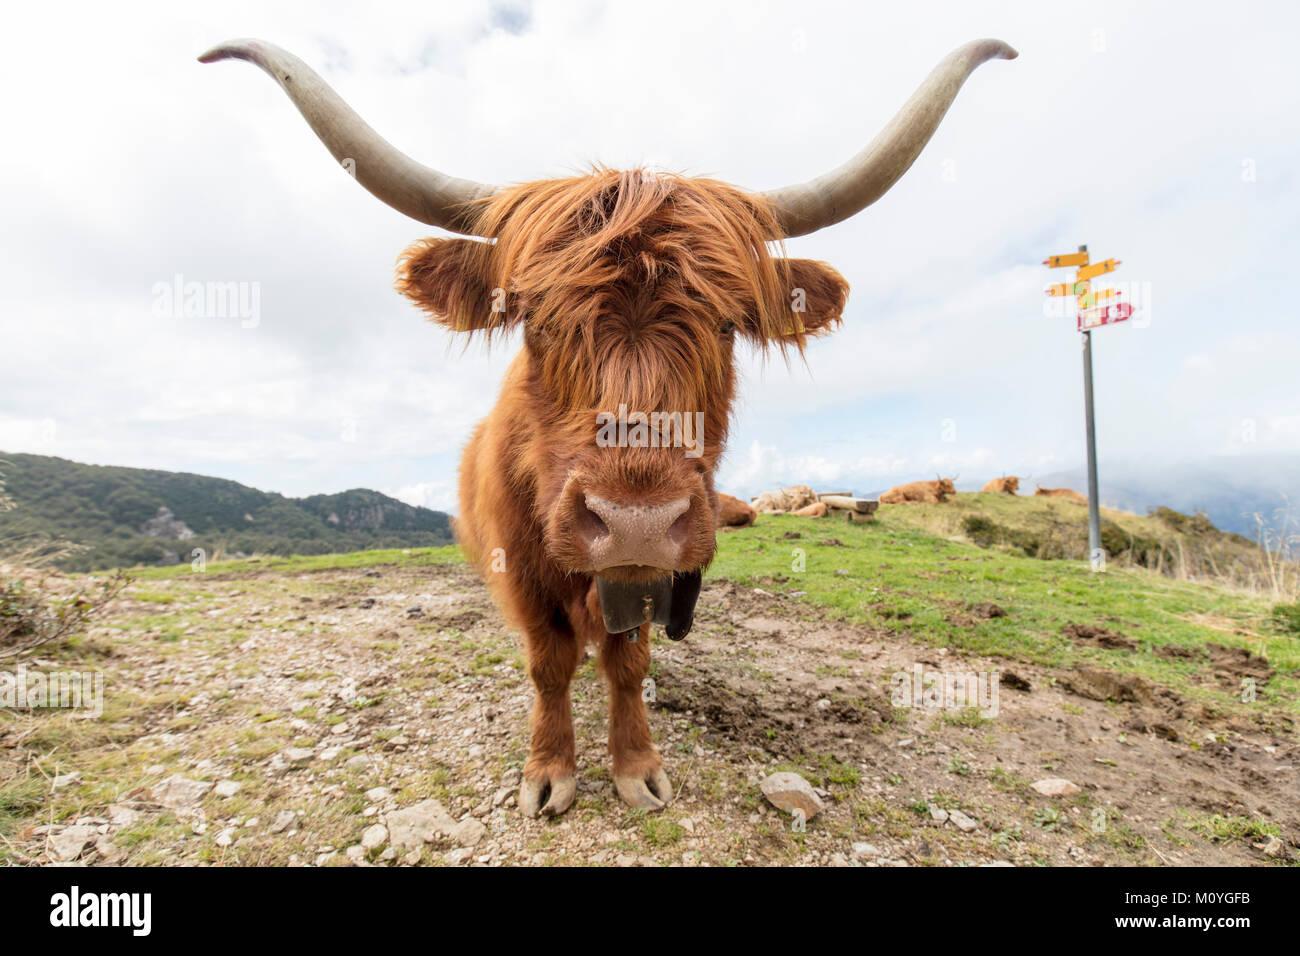 Scottish Highland Cattle (Bos taurus),hiking trail near Bogno,Ticino,Switzerland - Stock Image